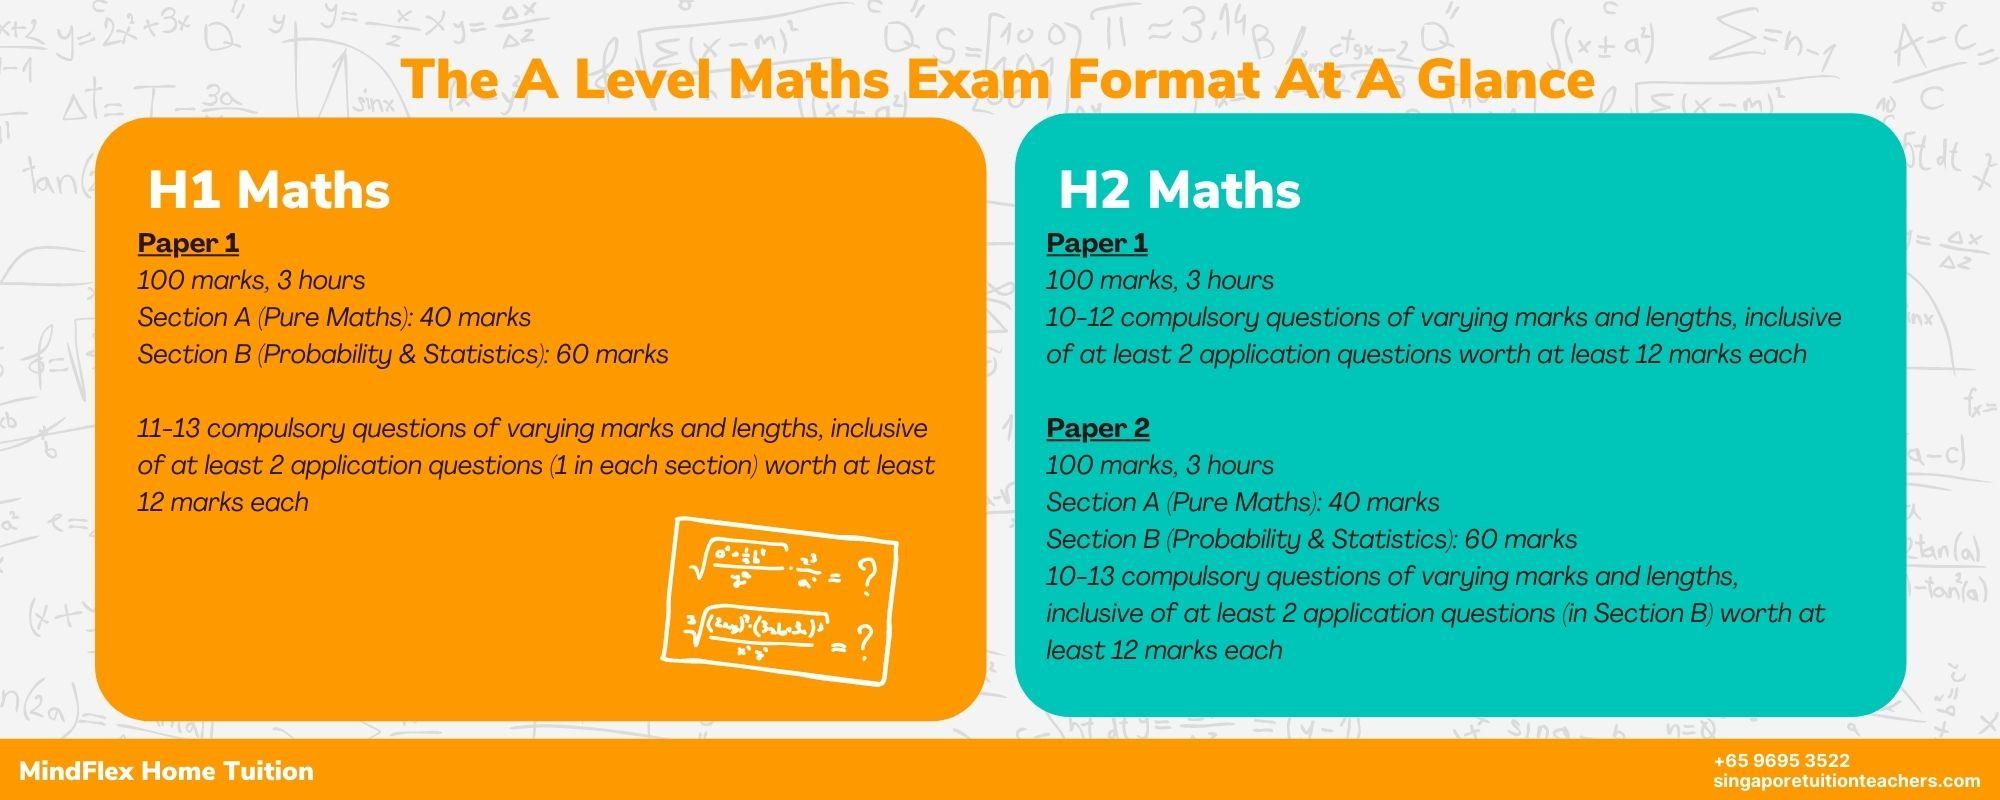 A Level Maths Infographic